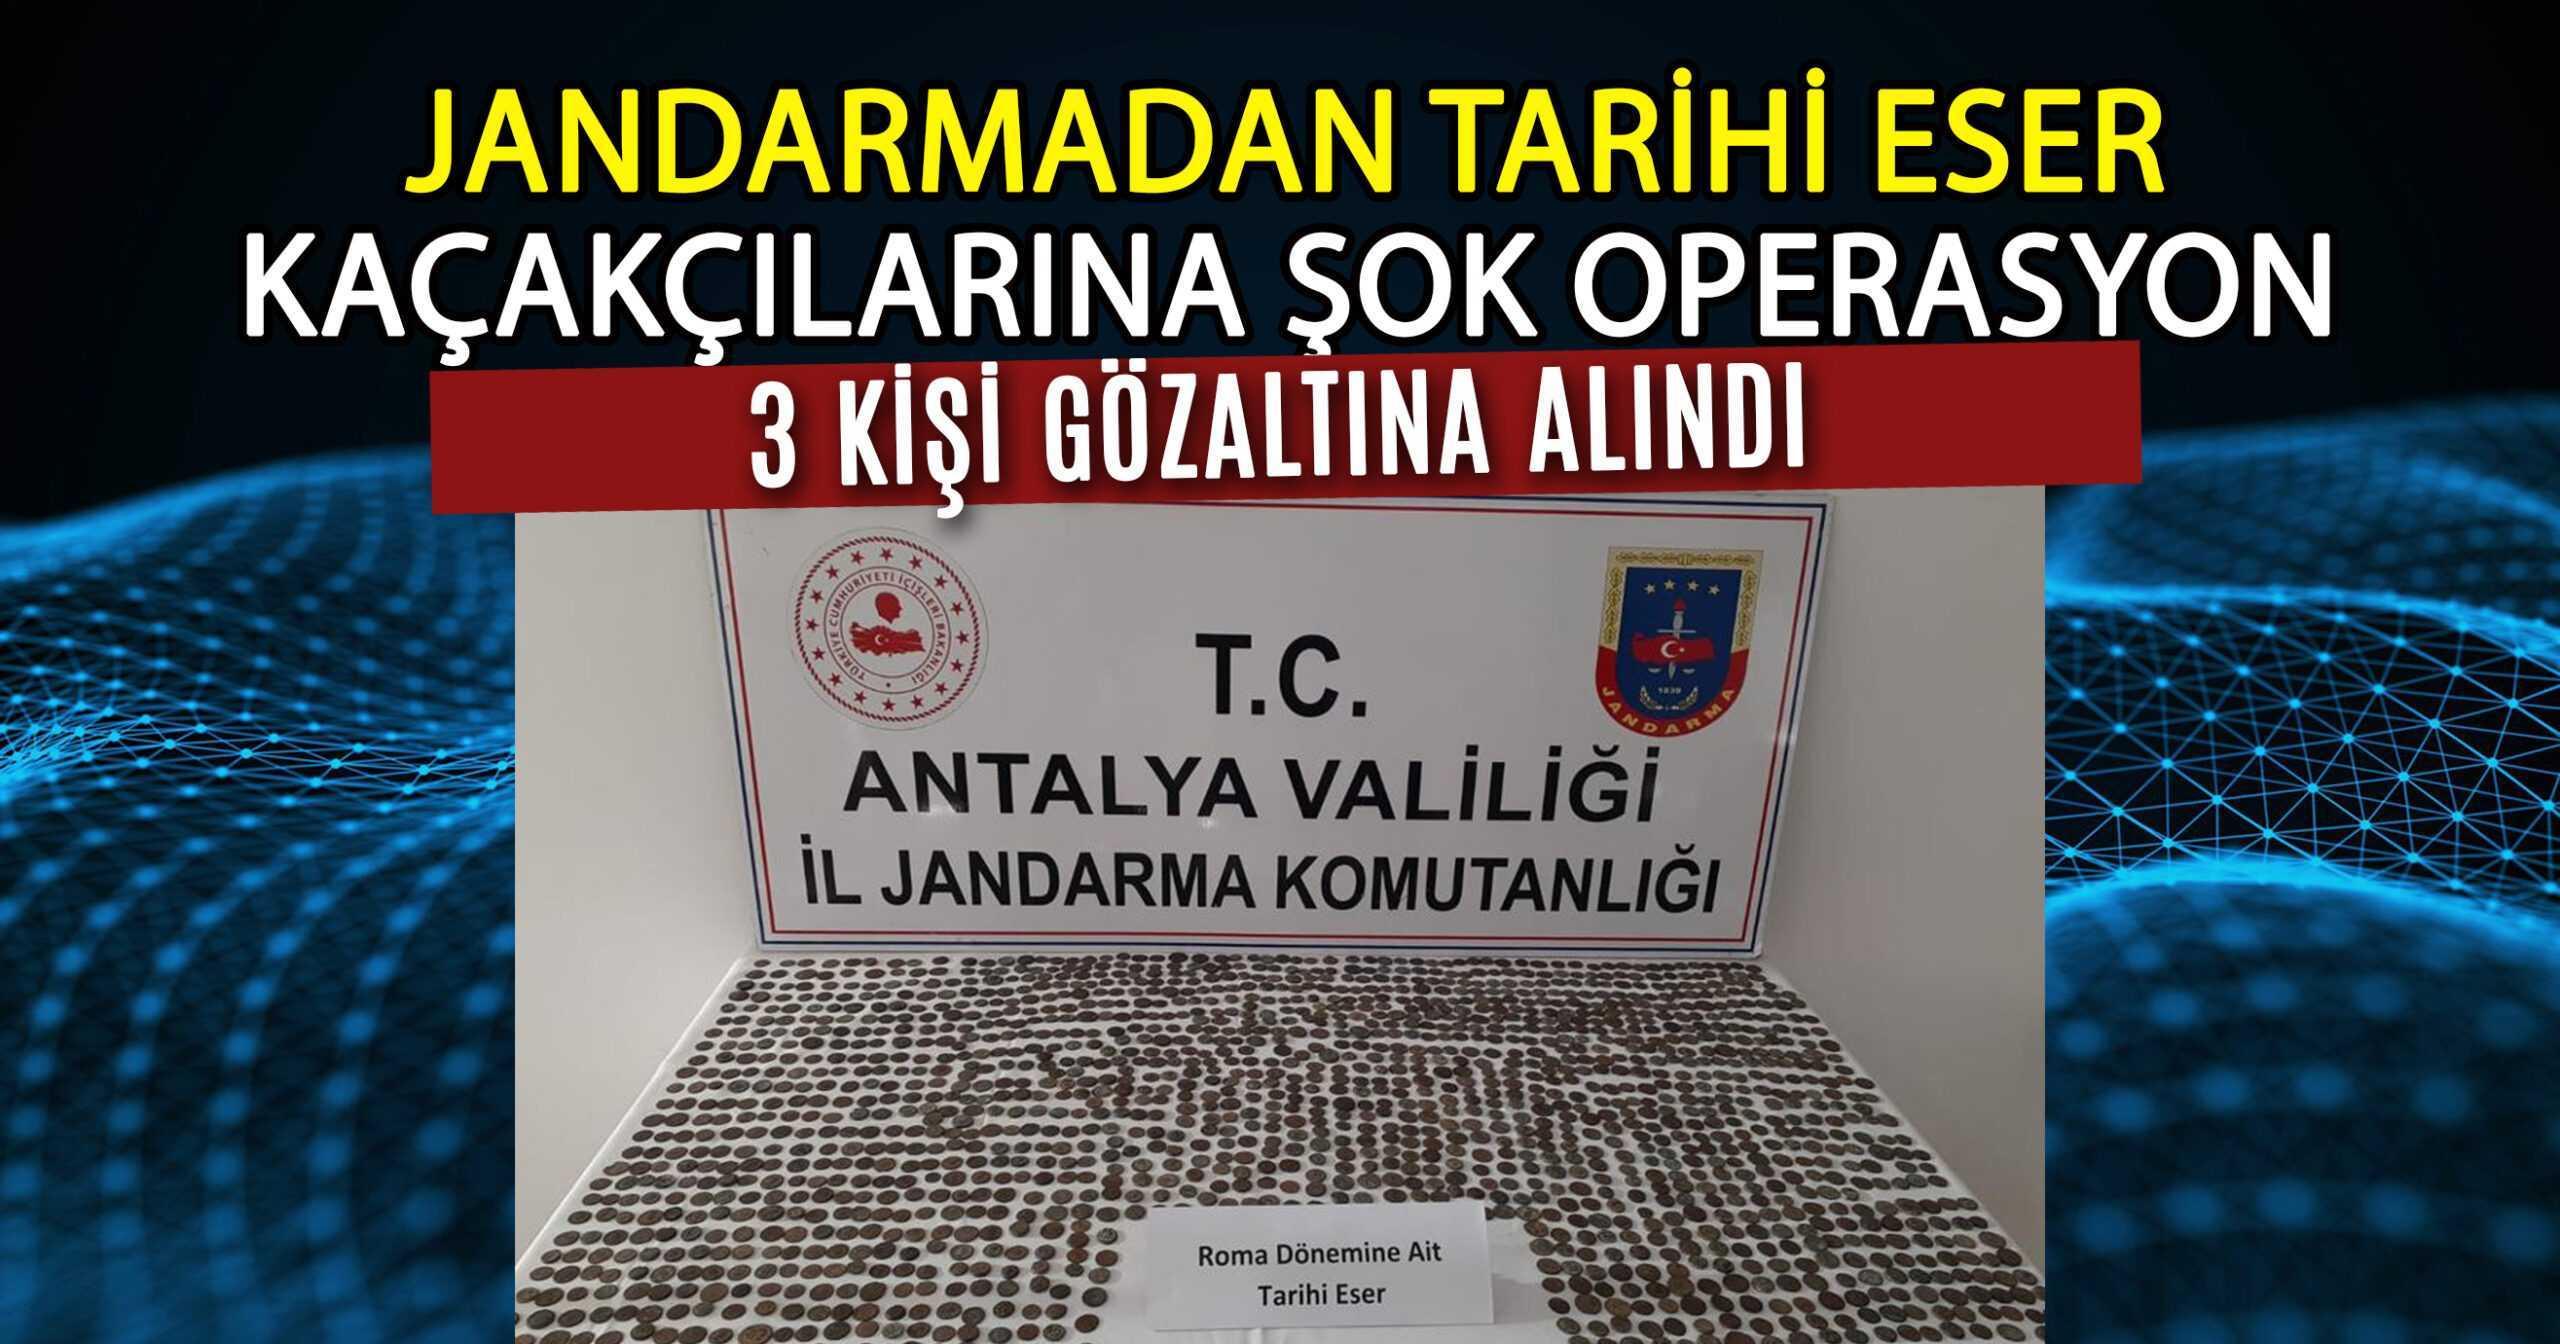 ALANYA'DAN MANAVGAT'A TARİHİ SİKKE KAÇIRMAK İSTEDİLER!